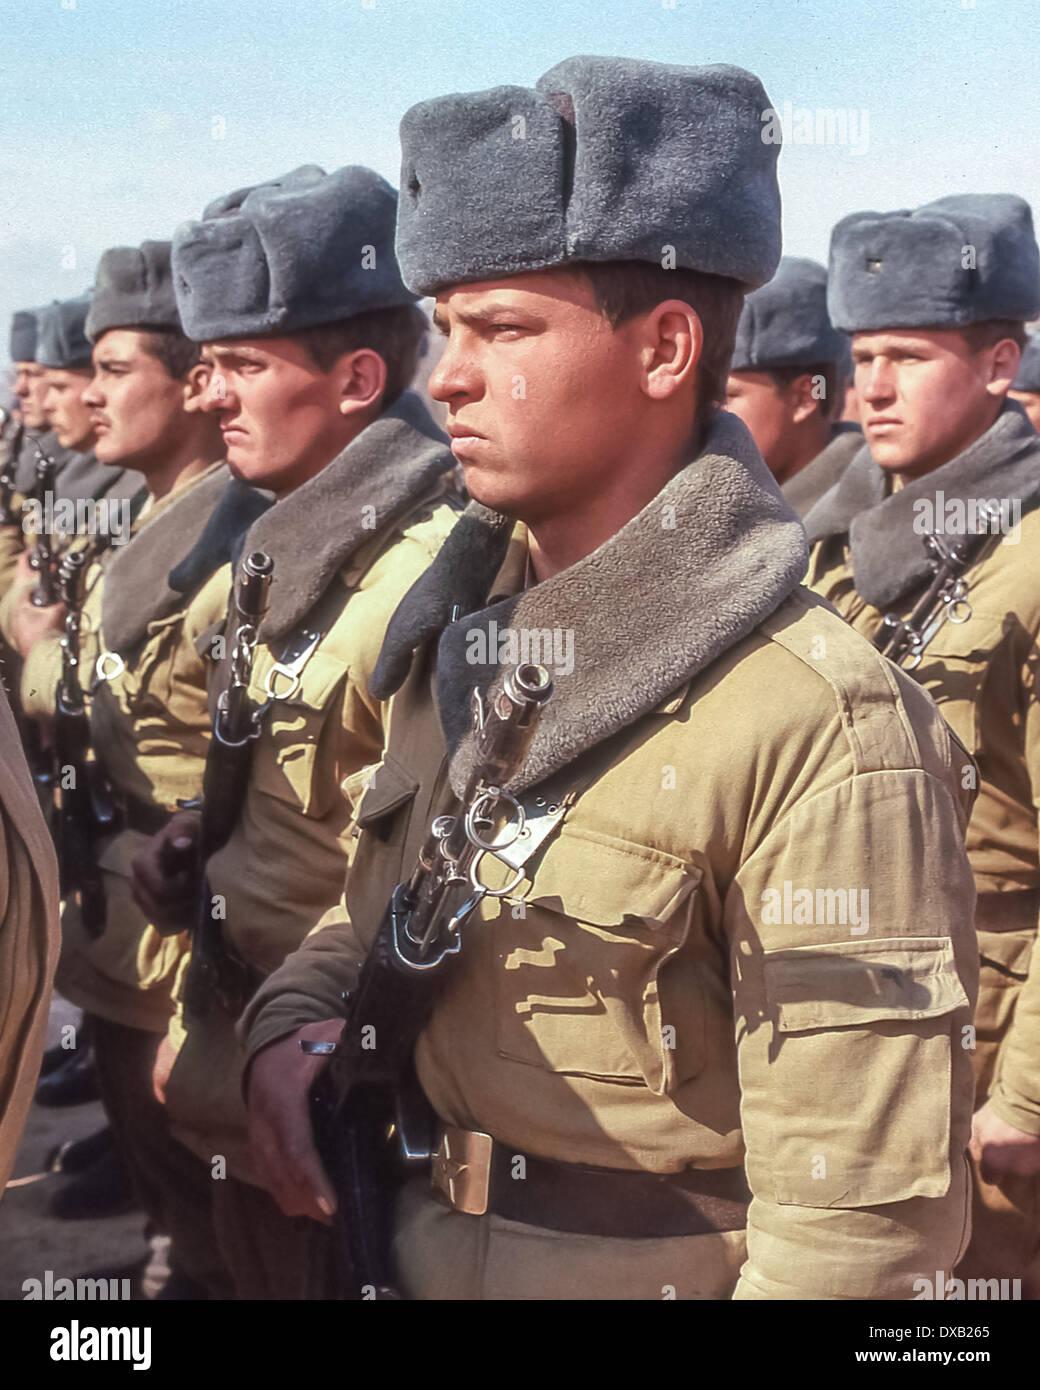 Soviet Afghanistan war - Page 6 Feb-16-1989-termez-uzbekistan-ru-armed-with-ak-47-kalashnikov-rifles-DXB265